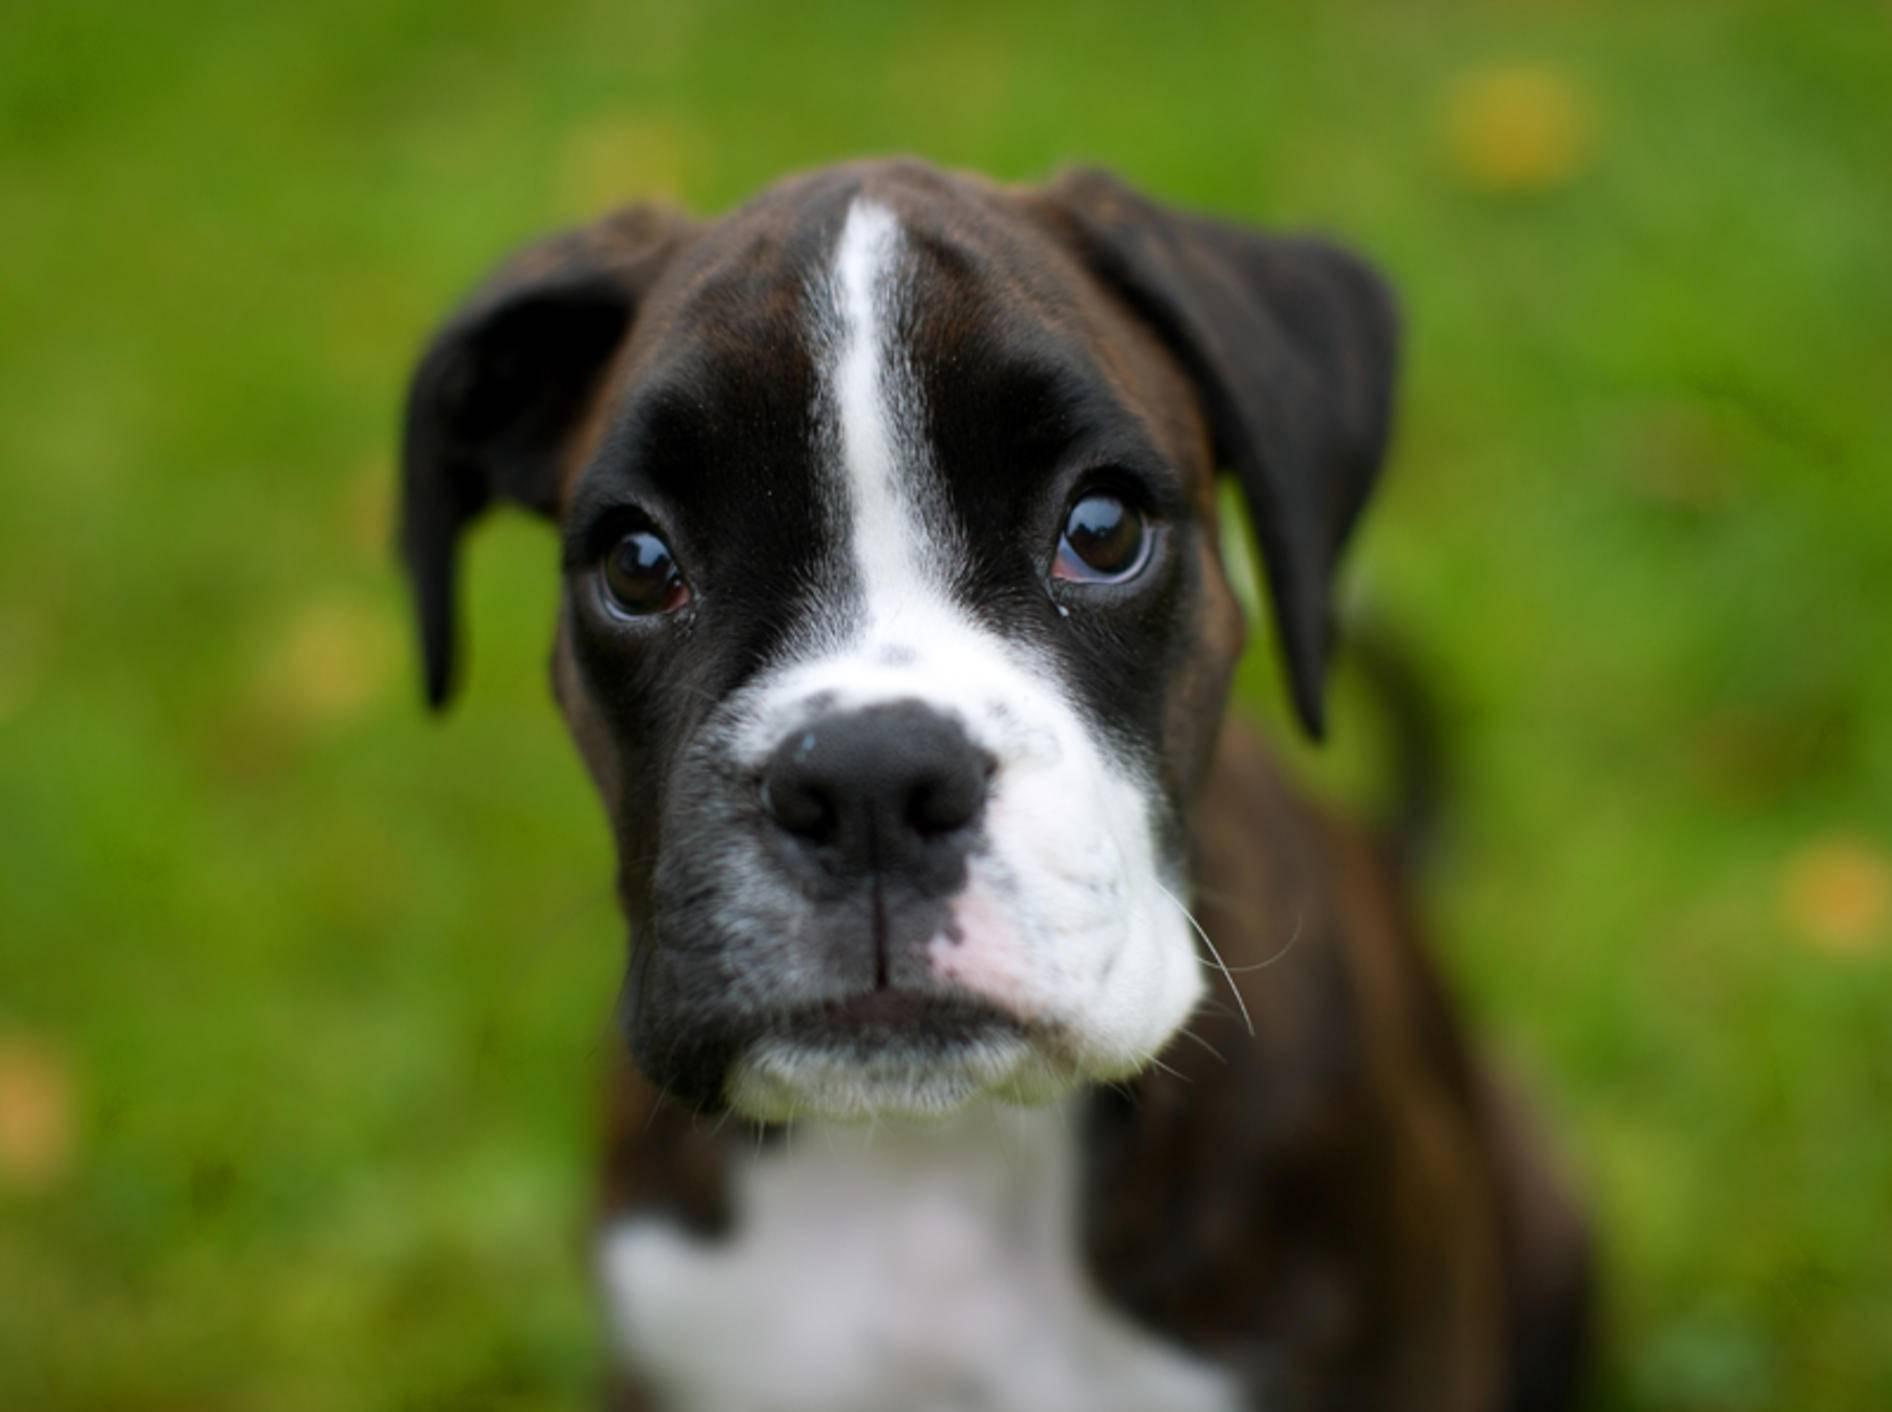 Deutsche Boxer beherrschen den Hundeblick in Perfektion – Bild: Shutterstock / Rasmus Holmboe Dahl